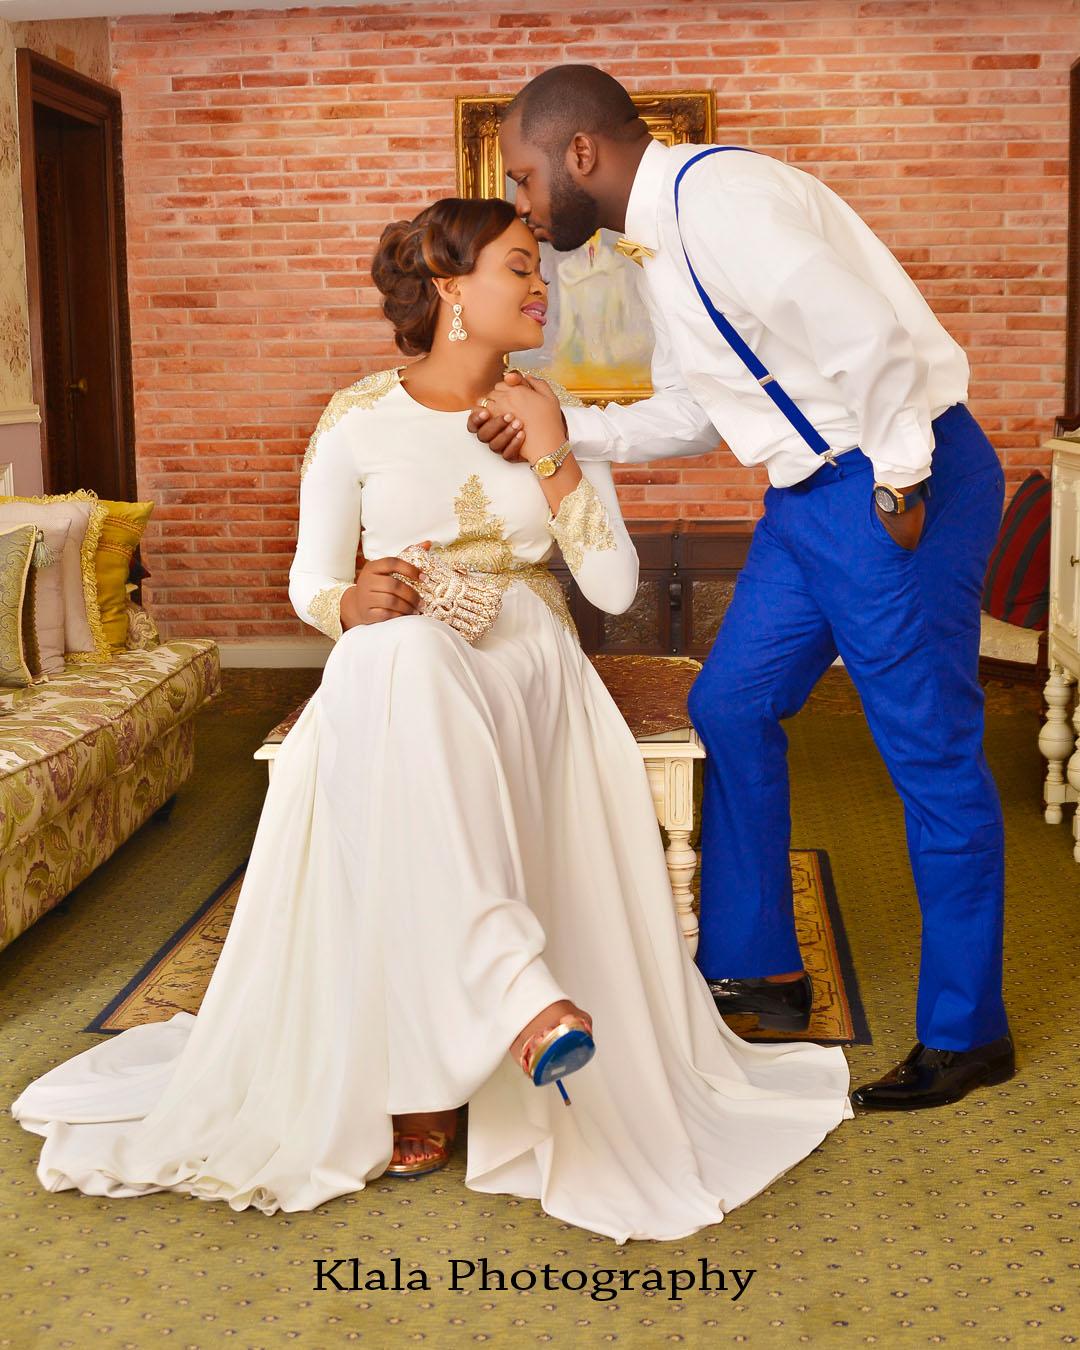 Wedding Family Shot List: Beautiful Family Mark 10th Year Wedding Anniversary With